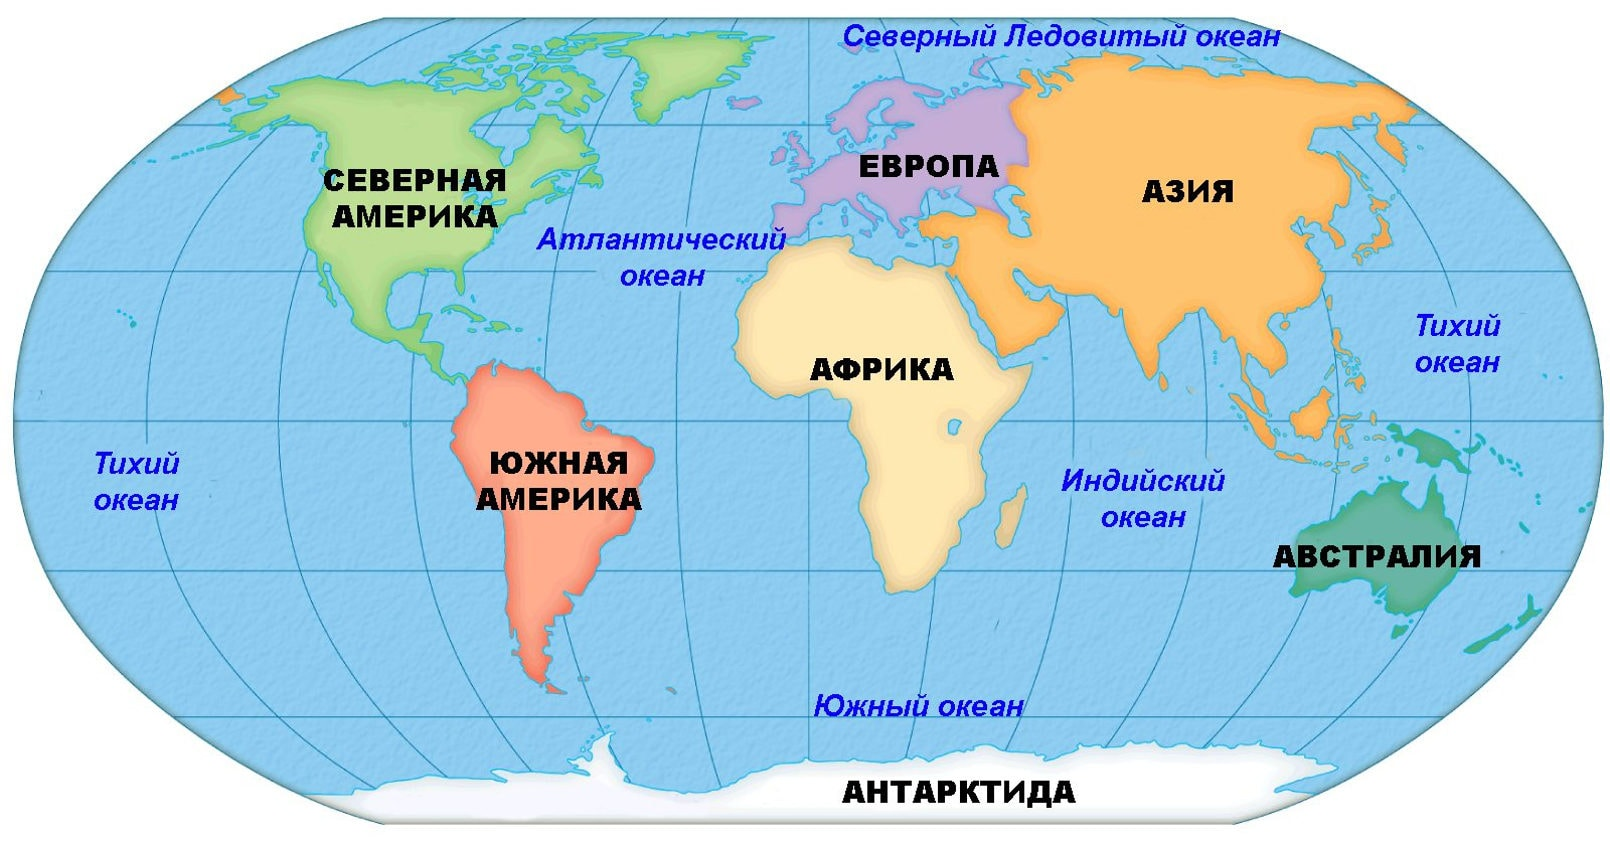 картинки земли с материками и океанами как